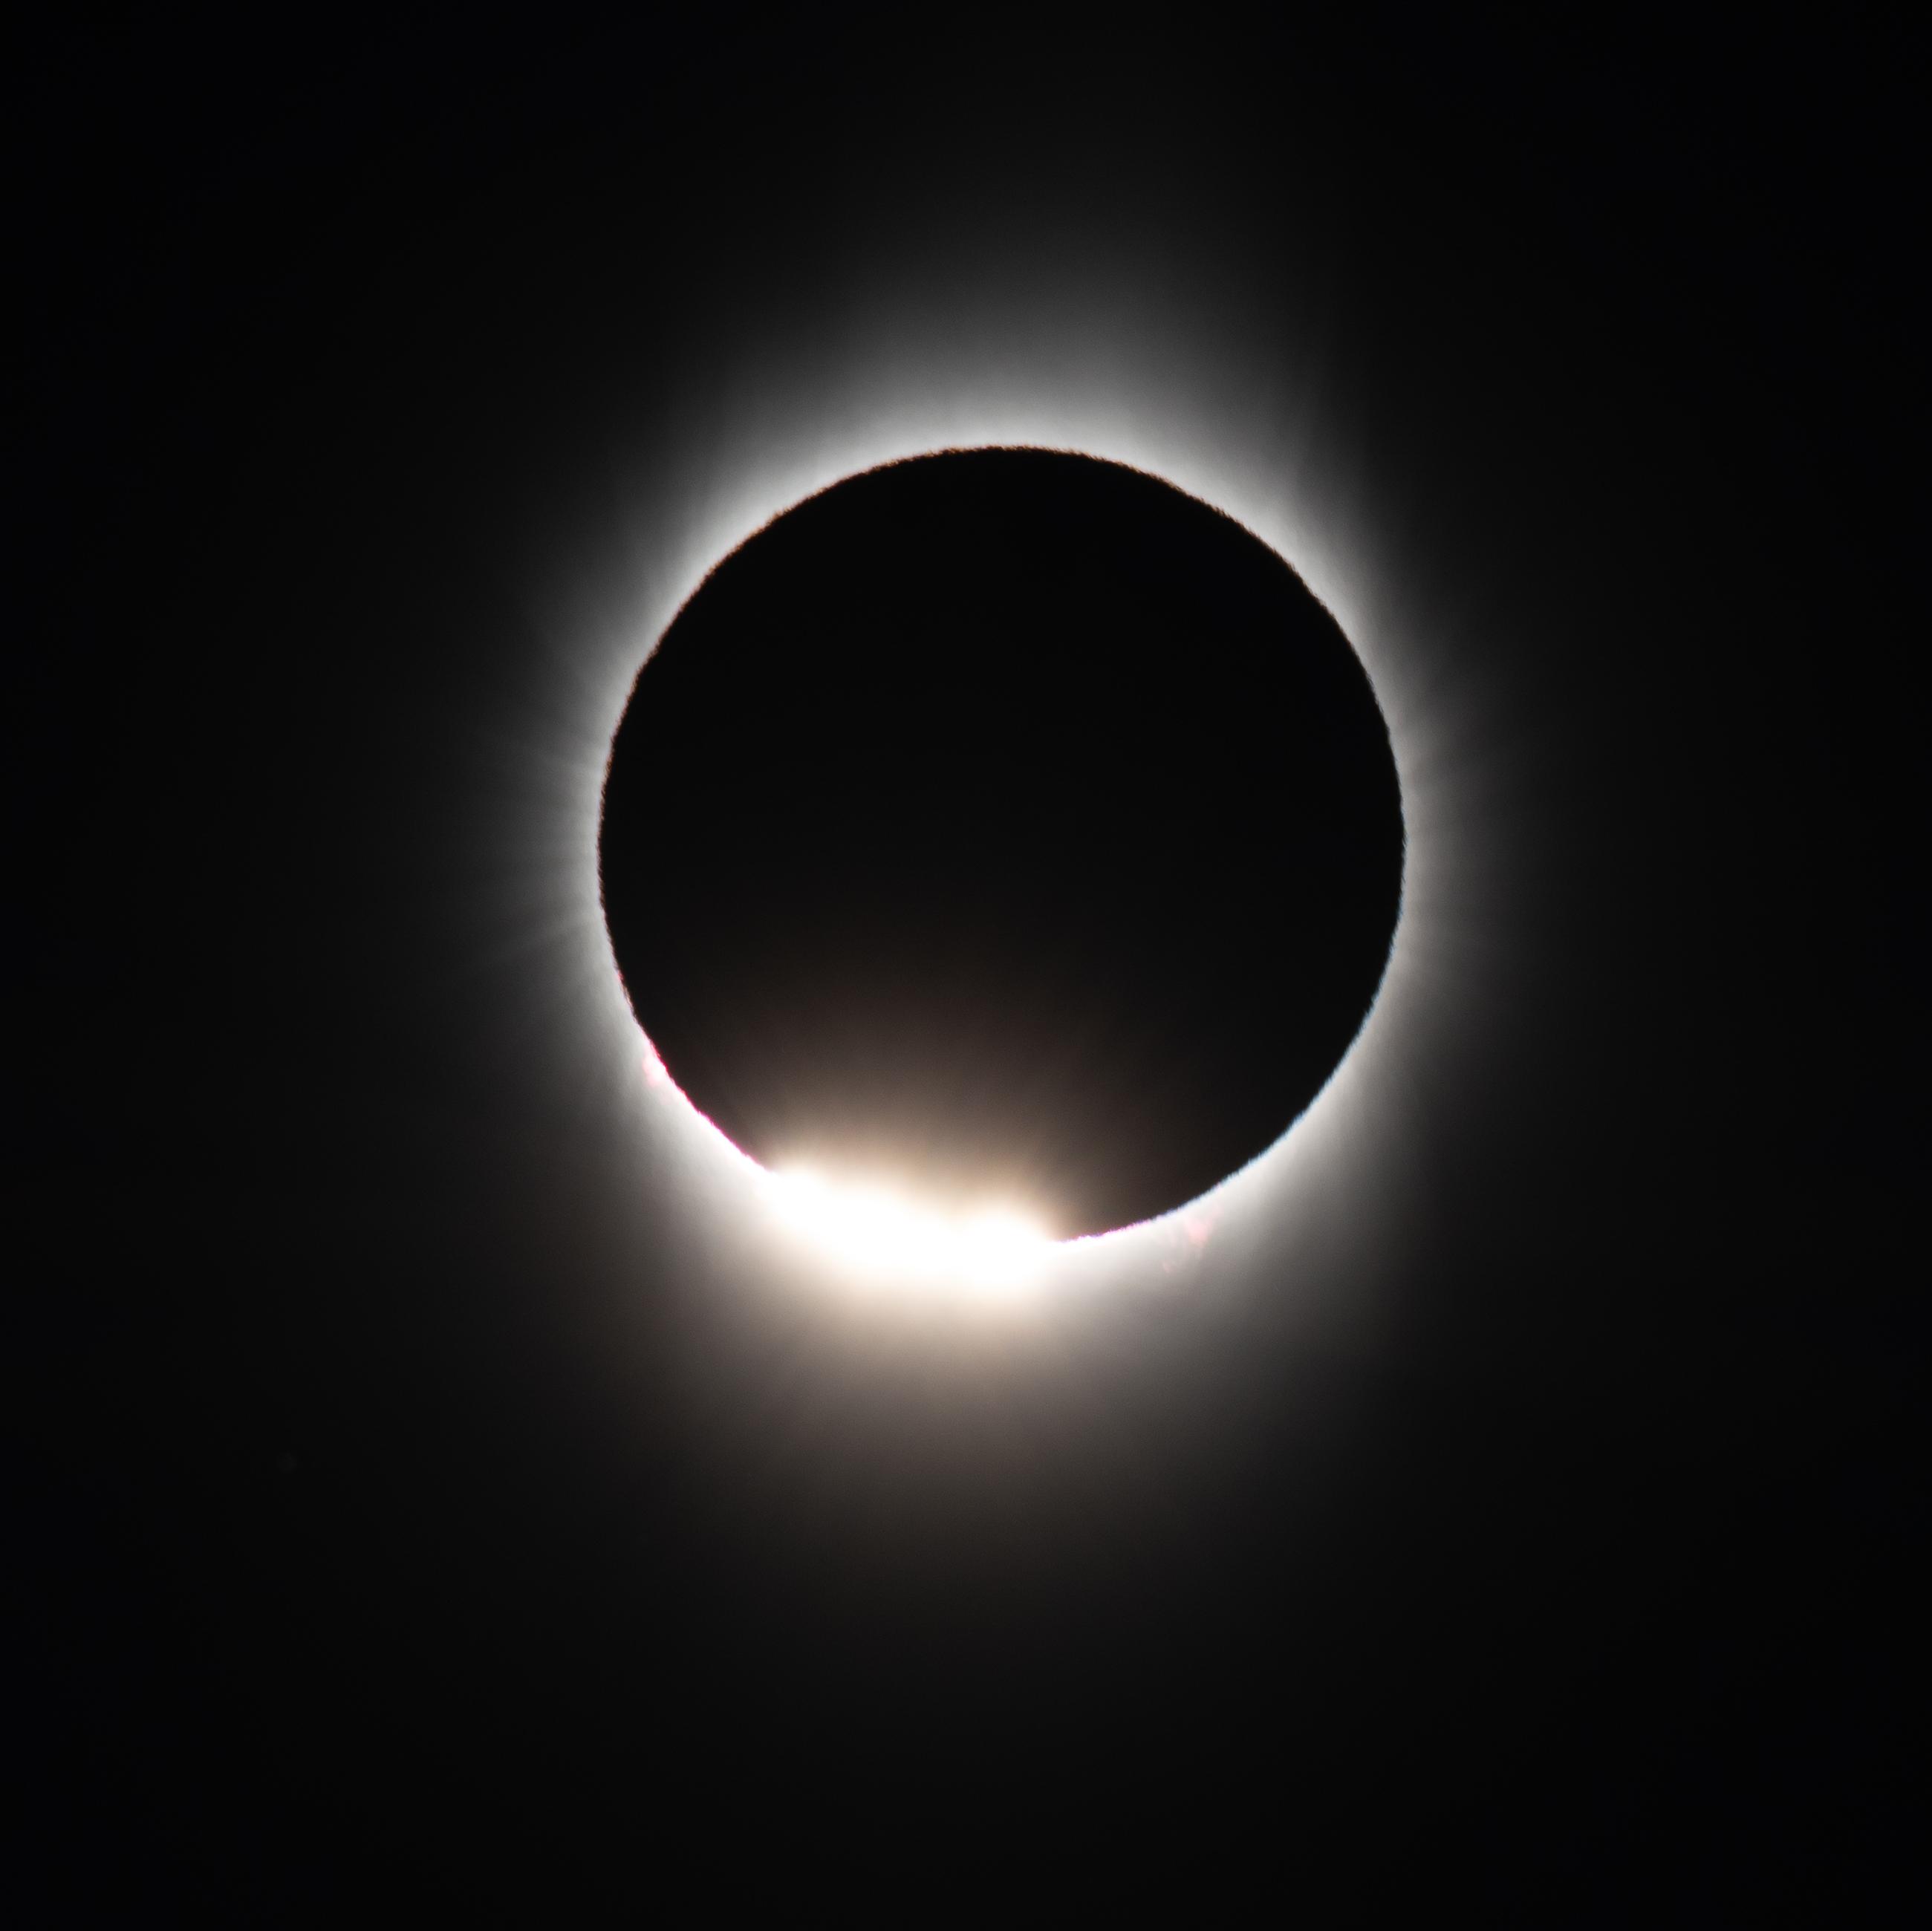 2019solareclipsevideoframes-psb_0024a_dsc_1690-nef-d8da9a6e0d76c9f3d32b27b5c07cabc0bb44338a